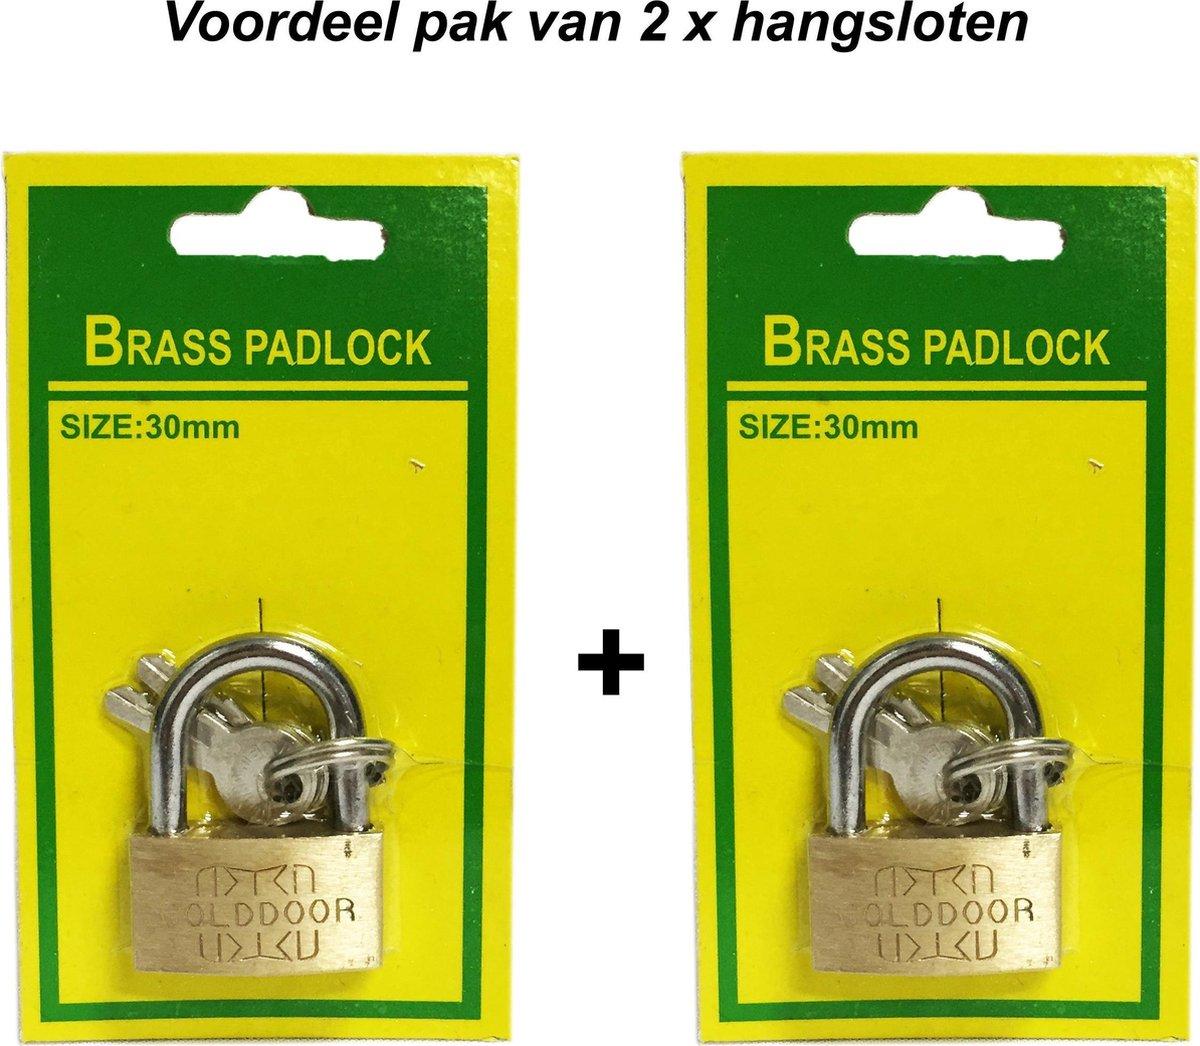 Hangslot 30MM |koffer slot |Bagageslot  voordeelpak 2 stuks - GOLDDOOR